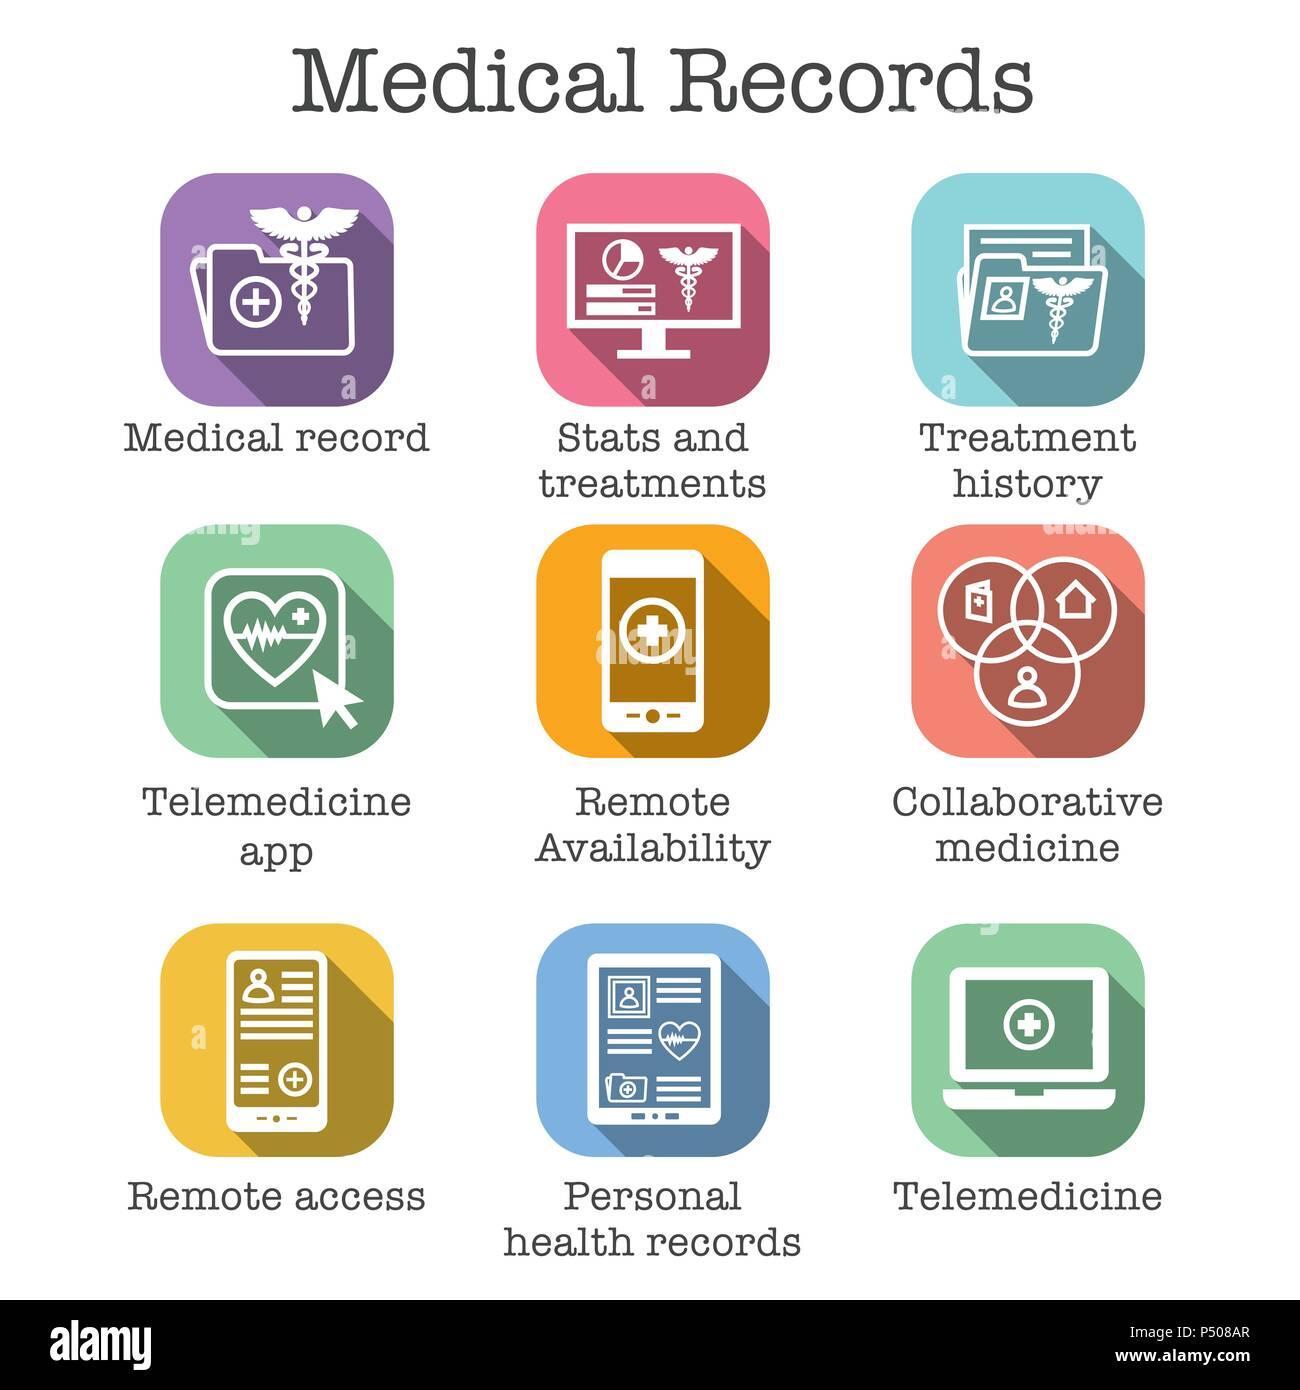 Telemedicine and Health Records Icon Set w Caduceus, file folders, computers, etc - Stock Image